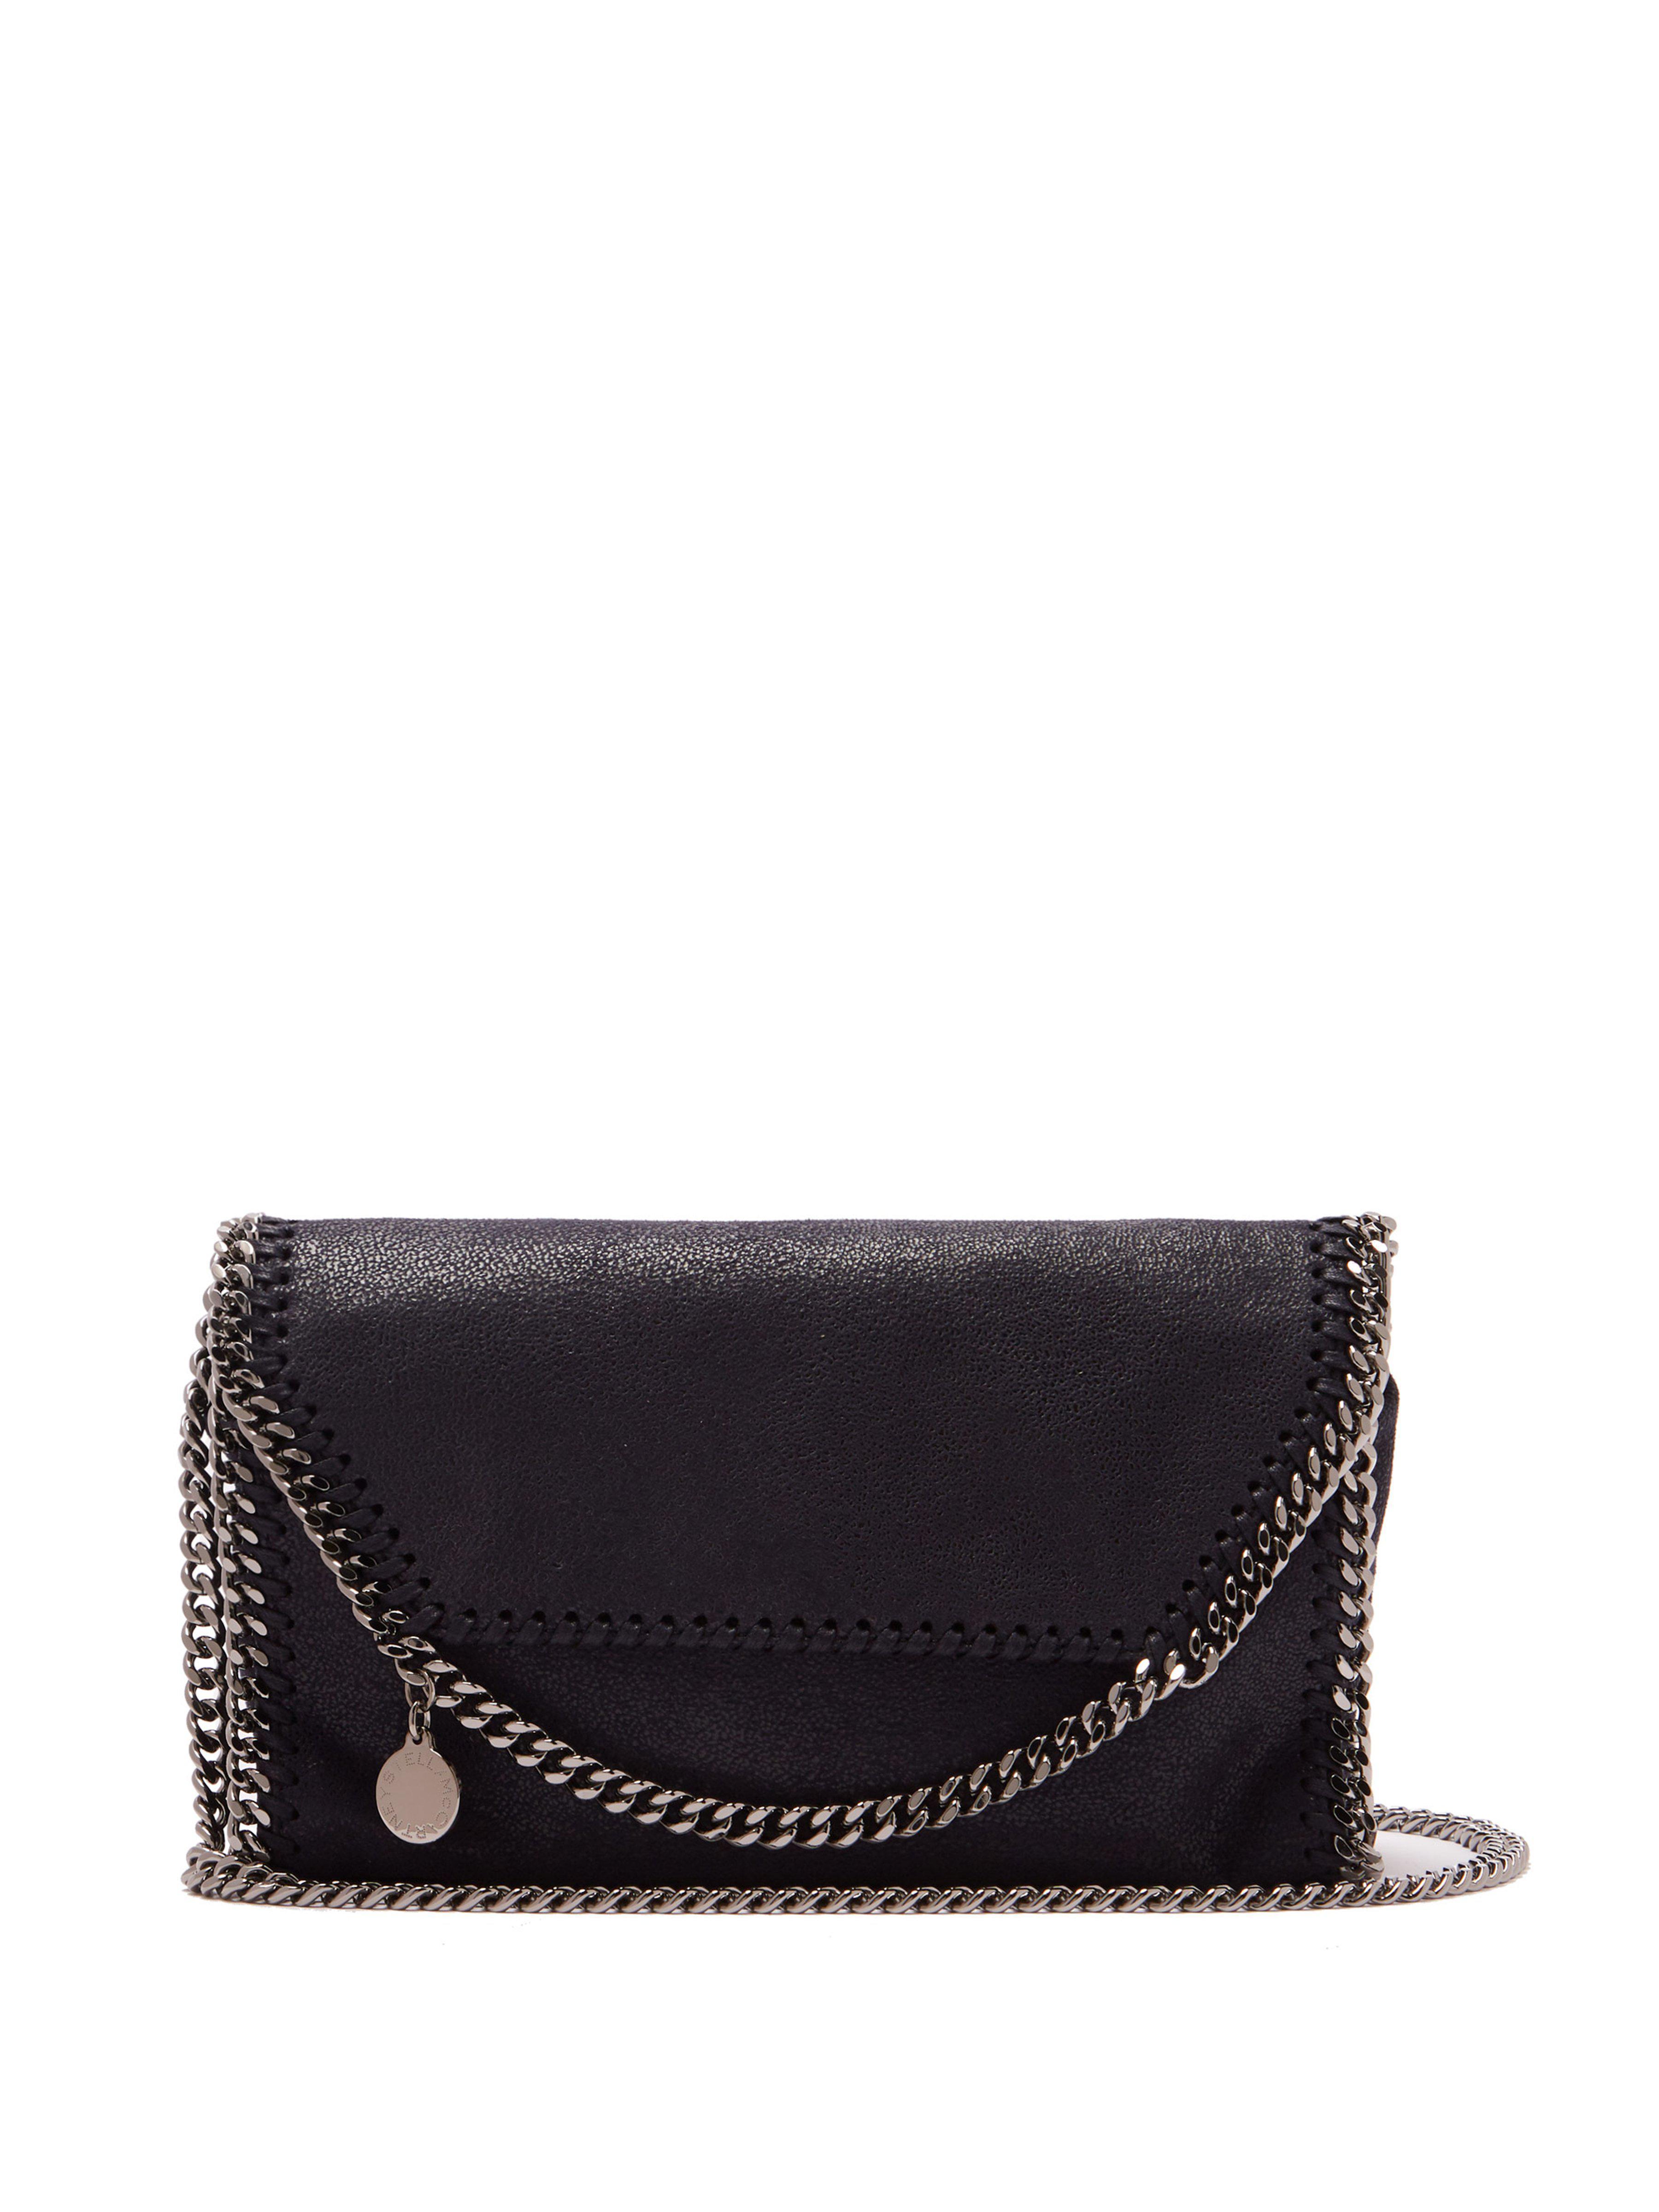 Stella McCartney. Women s Blue Falabella Faux-leather Mini Cross-body Bag fe5c41a0158af